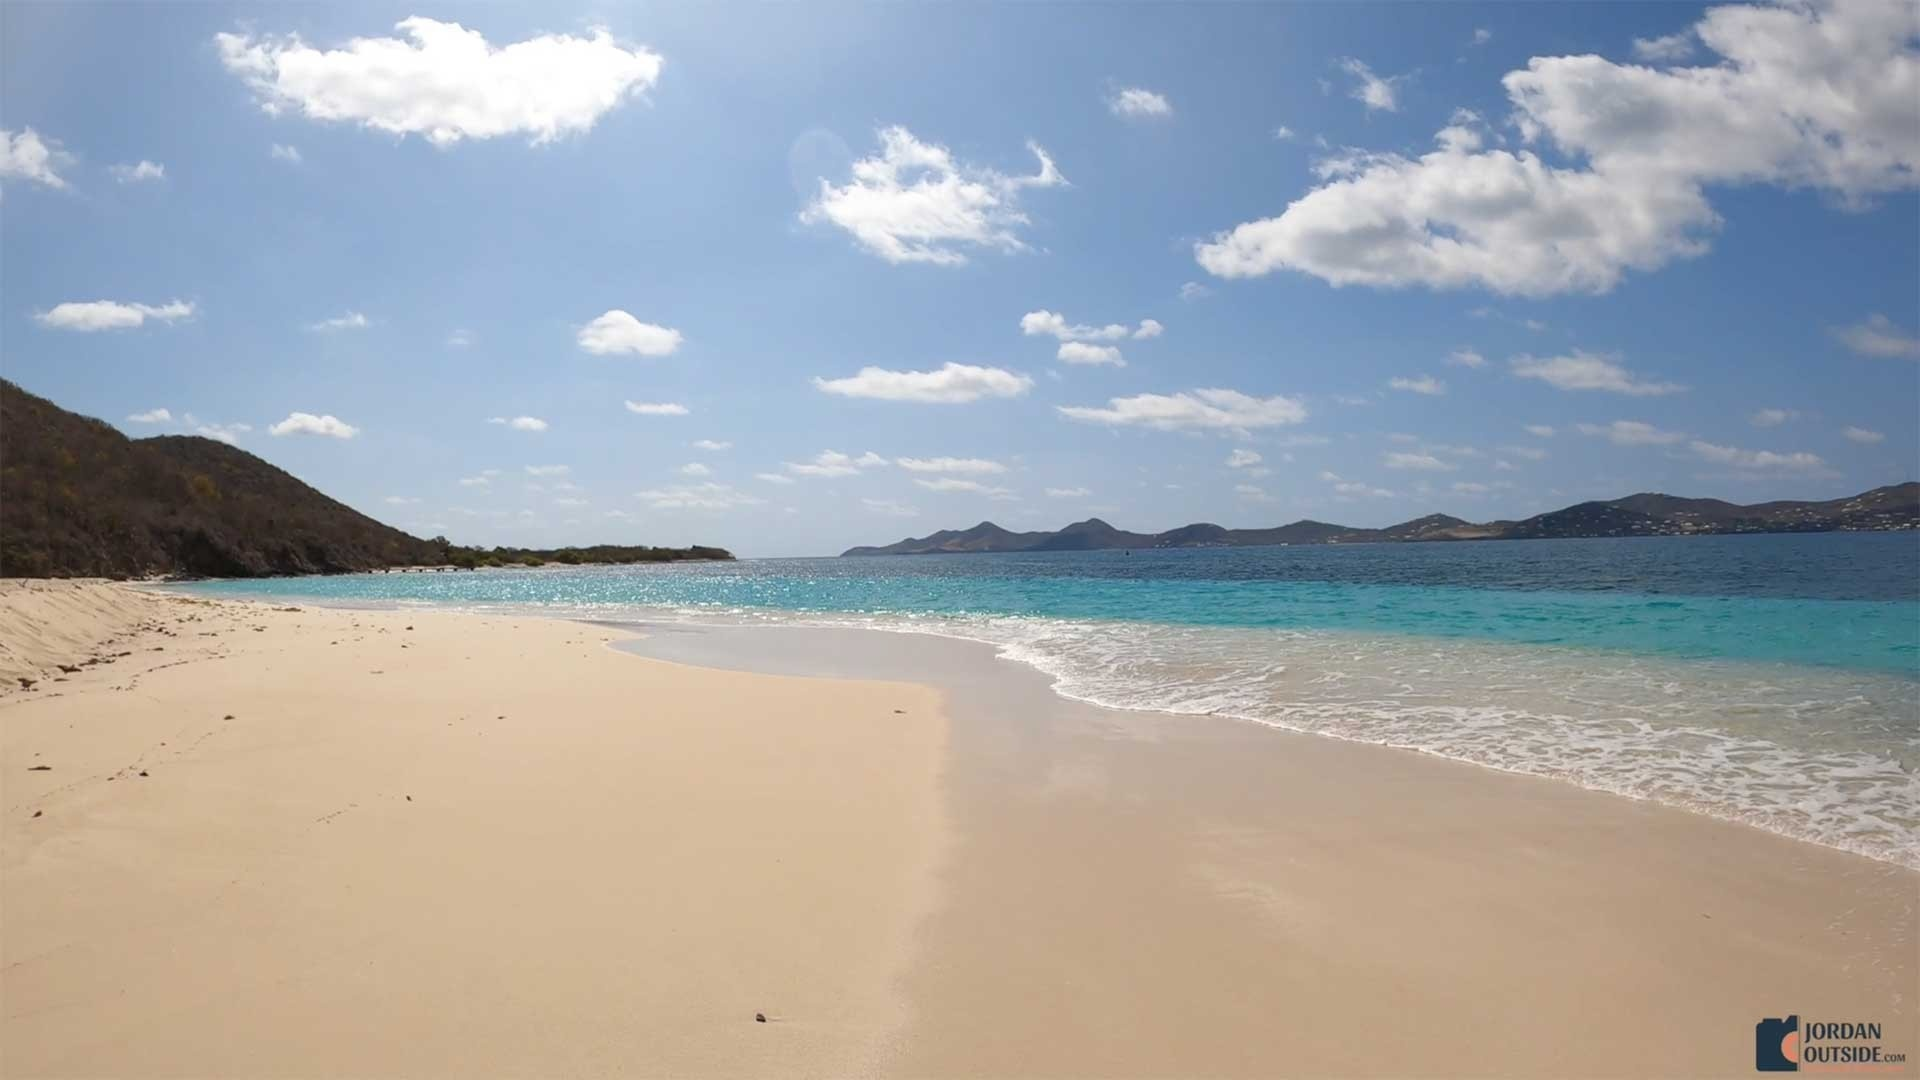 Turtle Beach at Buck Island, St. Croix